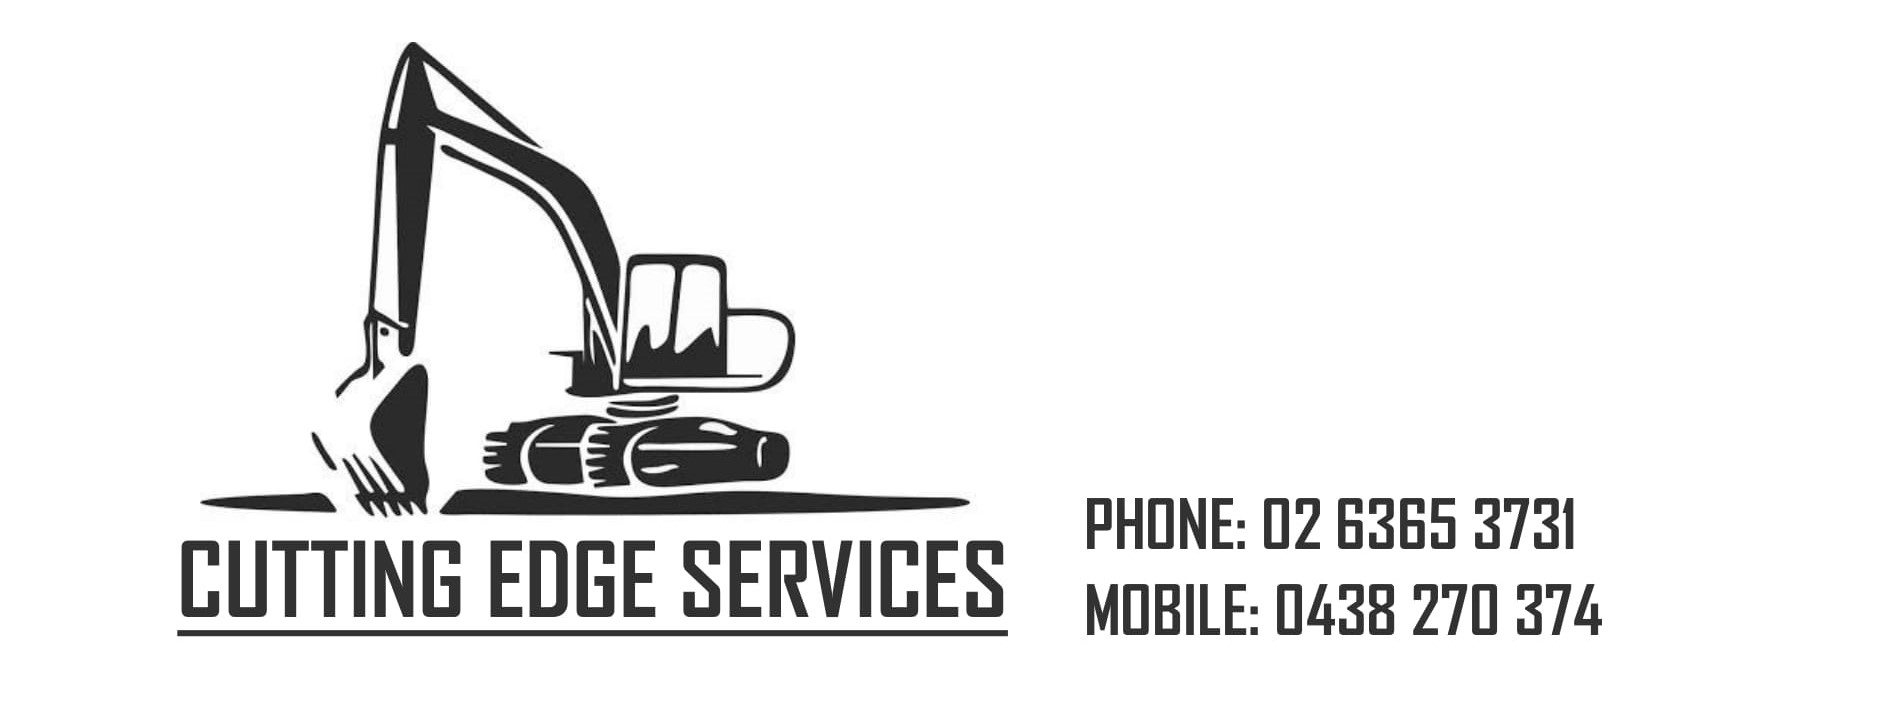 Cutting Edge Services